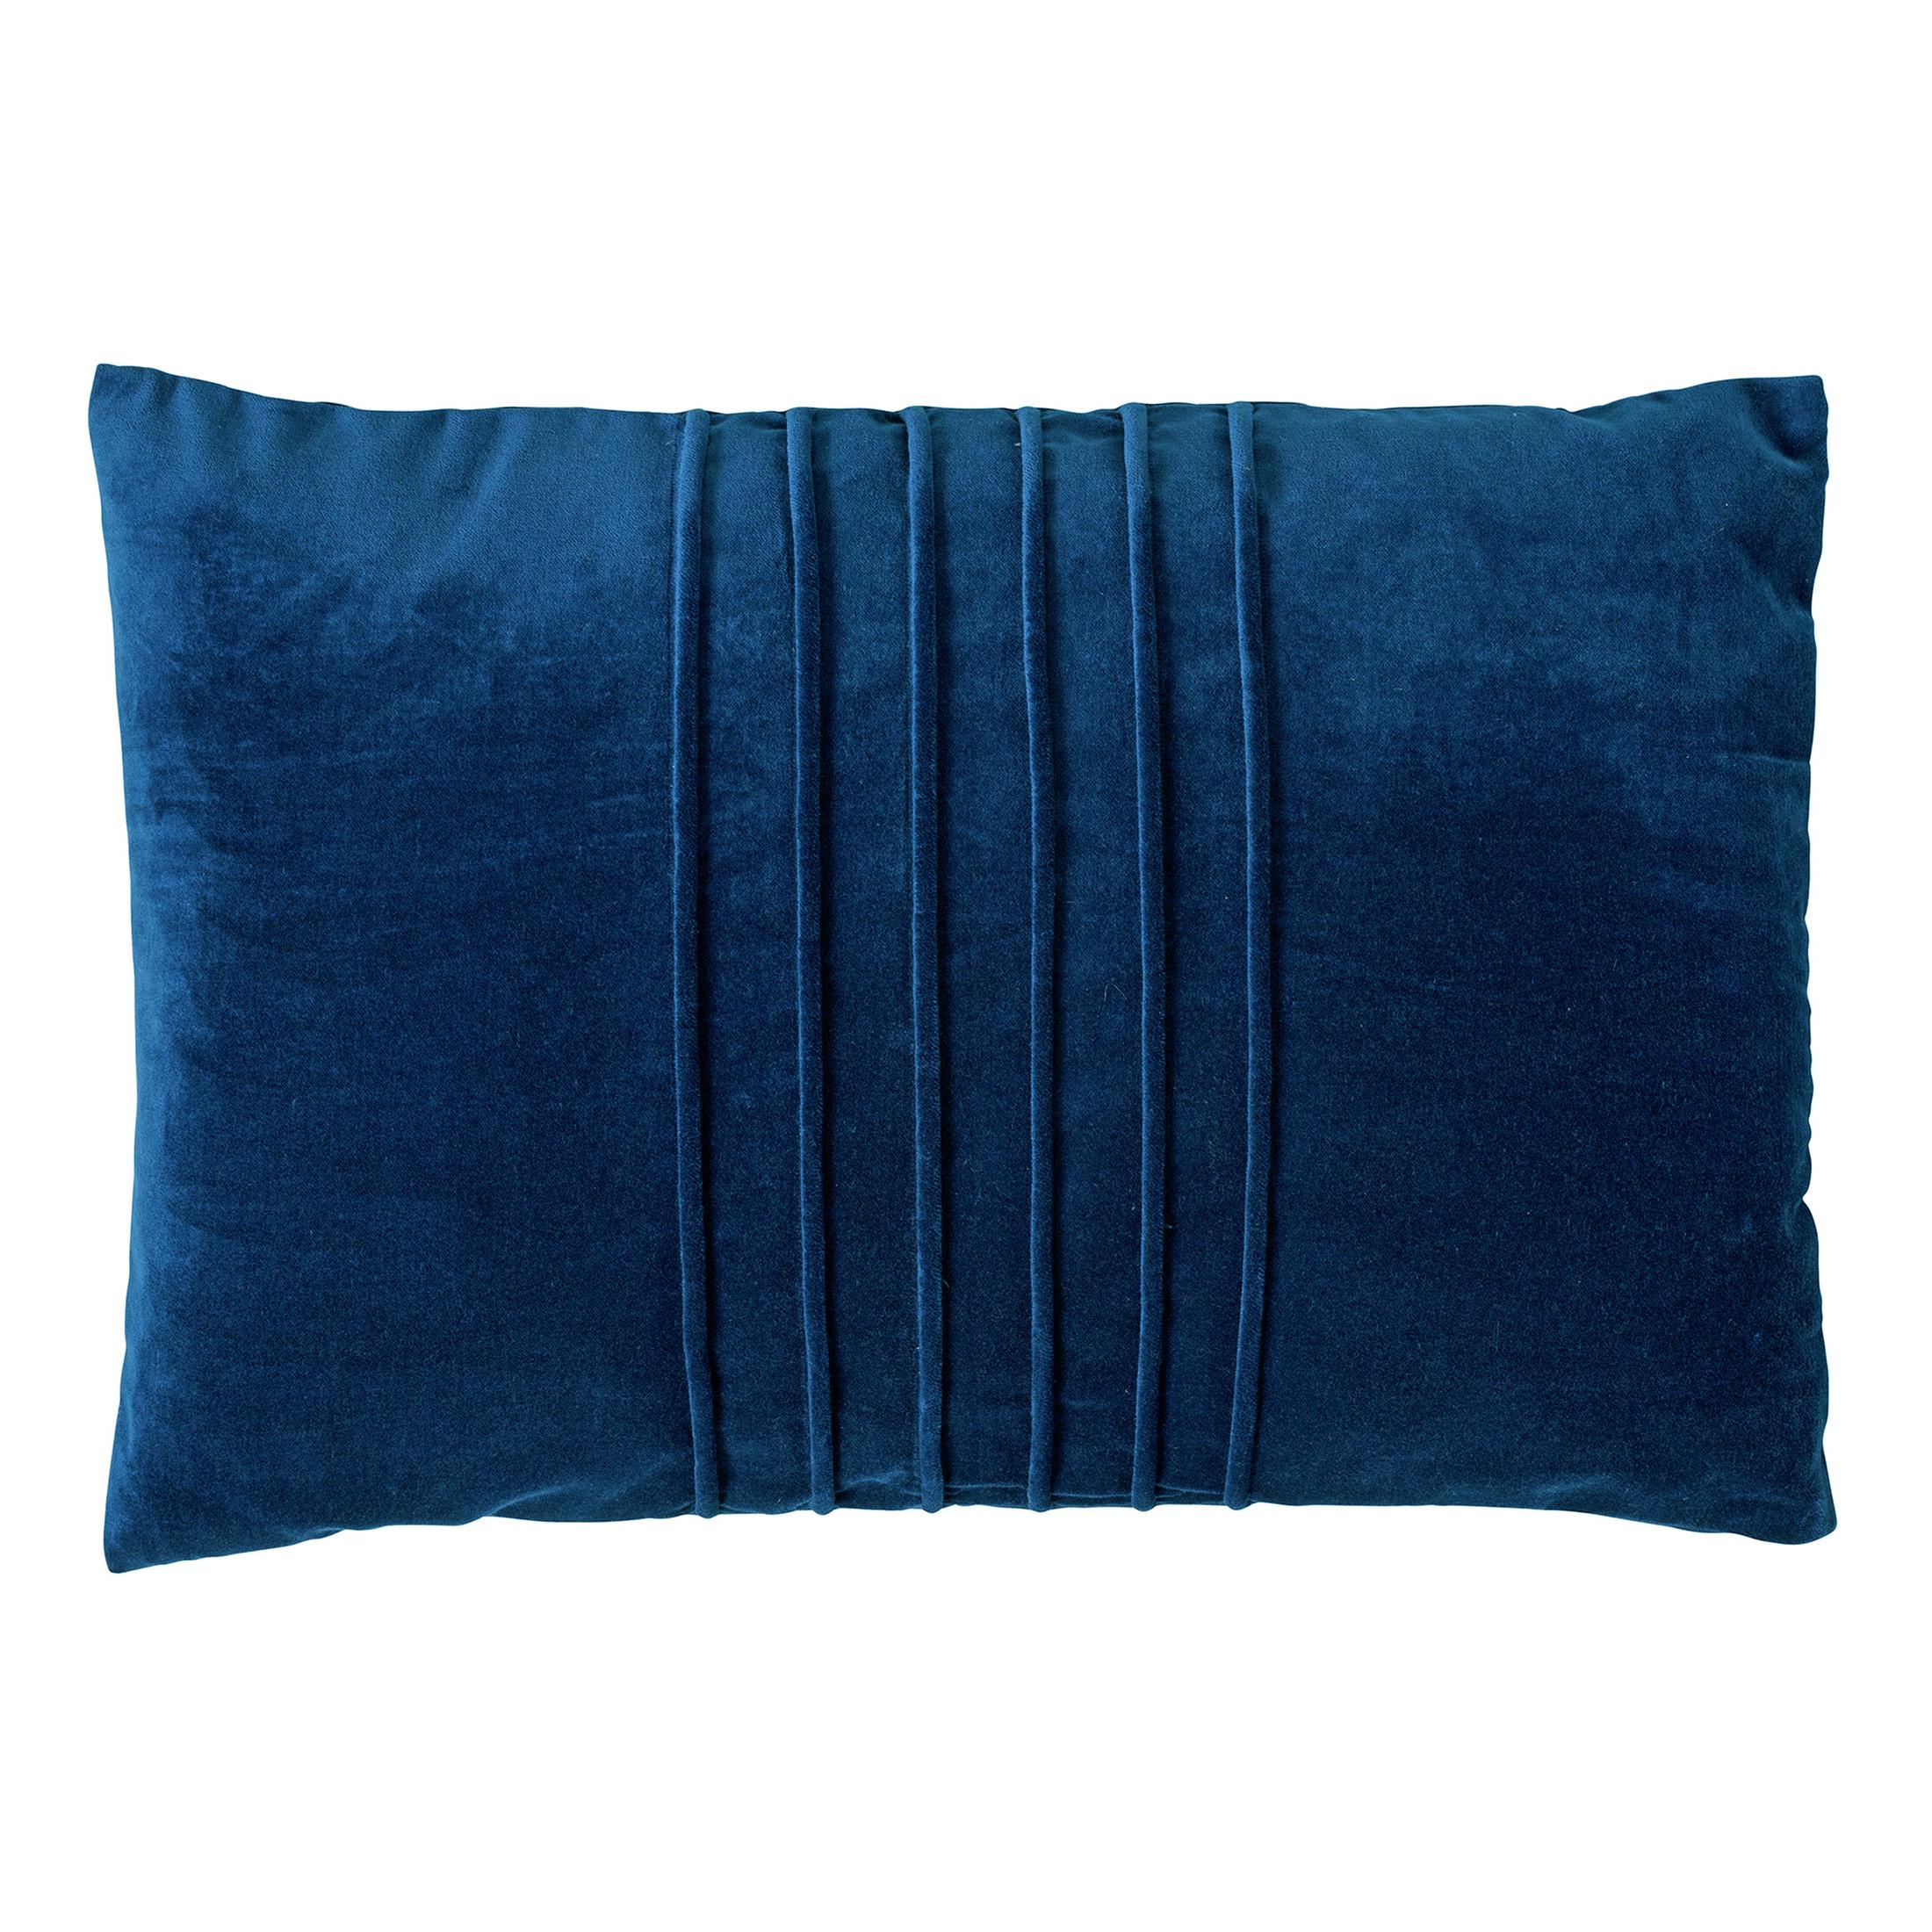 PAX - Kussenhoes velvet 40x60 cm Insignia Blue